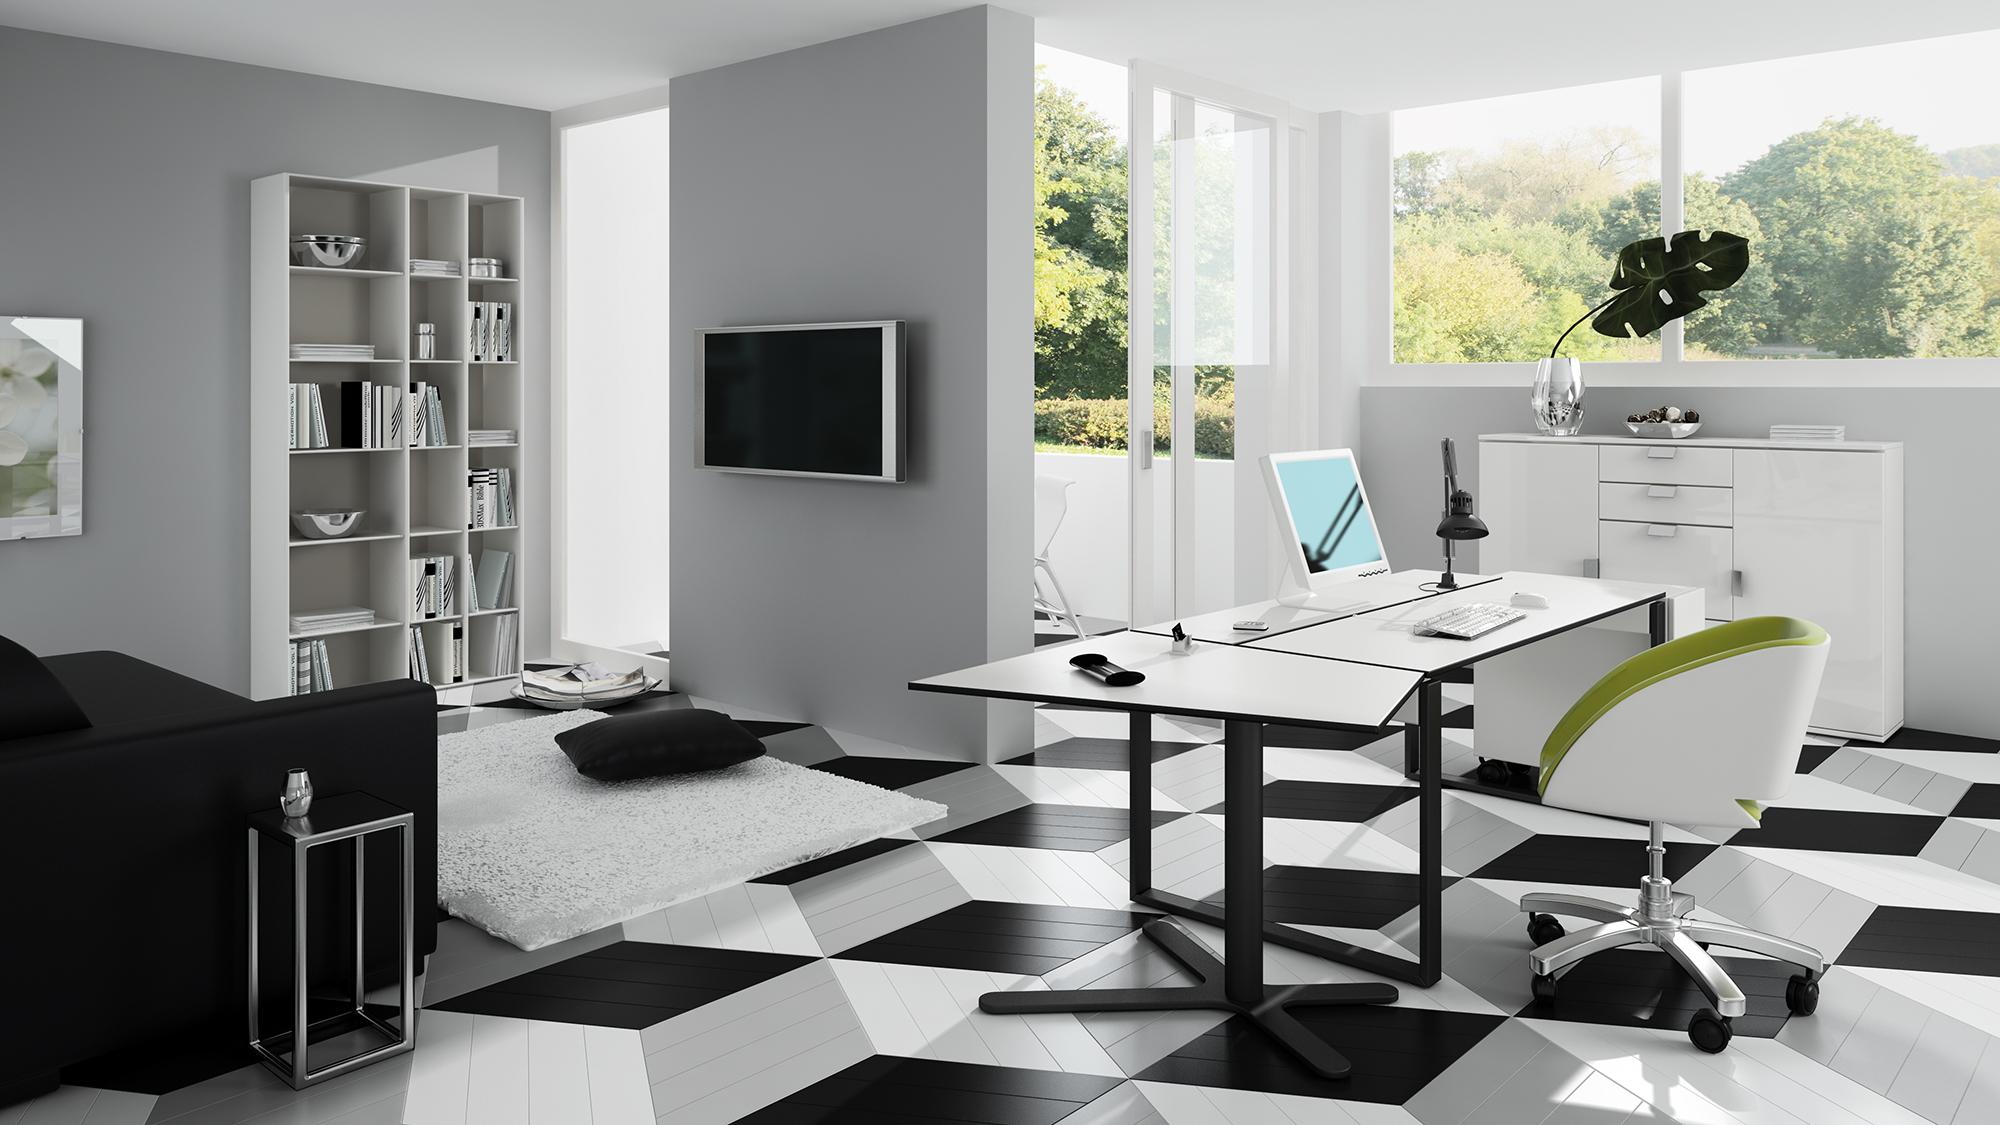 1wow-design_chevron-floor.jpg